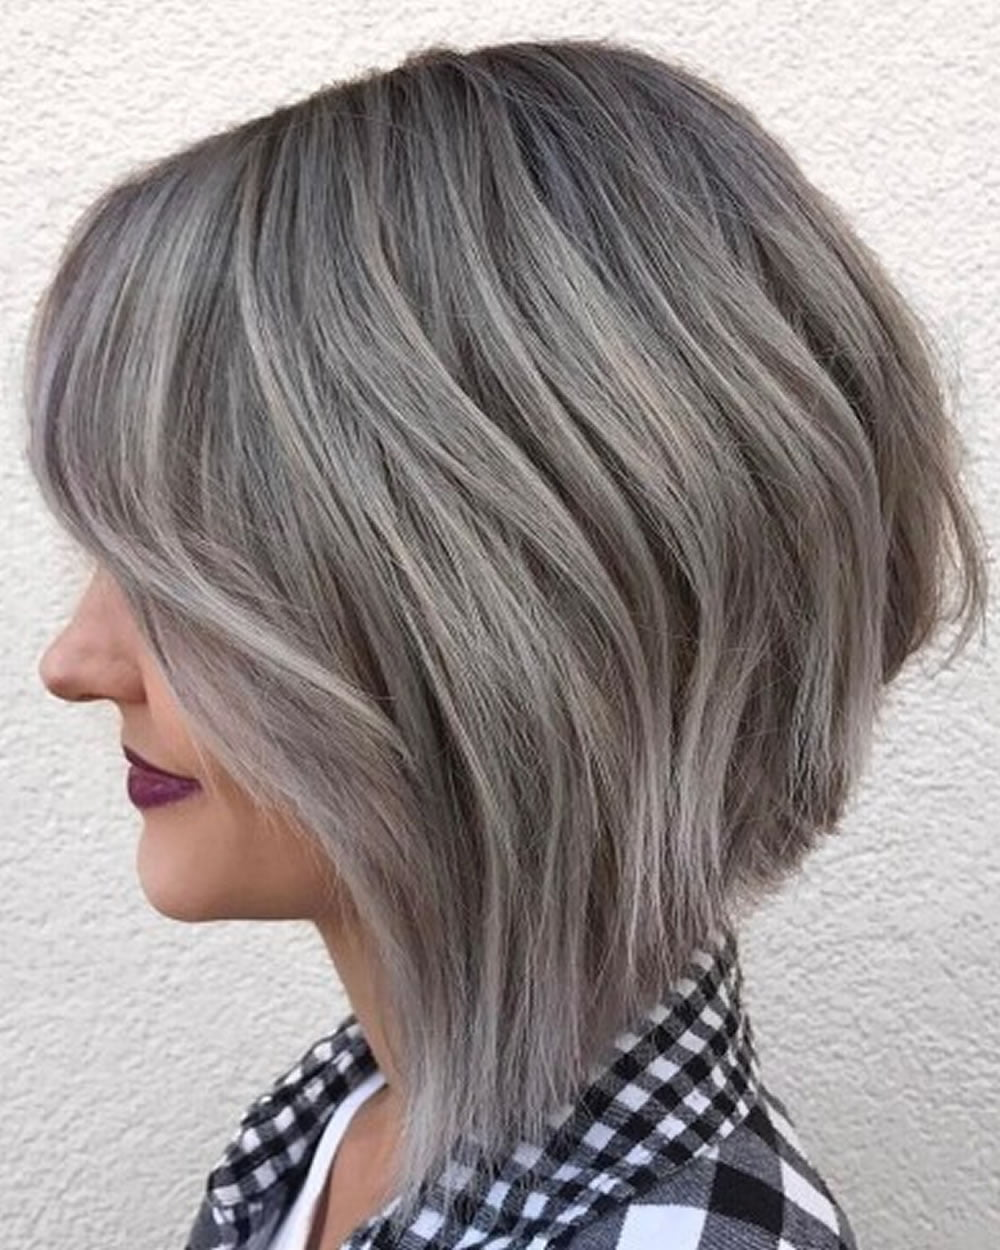 asymmetrical short haircuts with balayage highlights 2018 – 2019